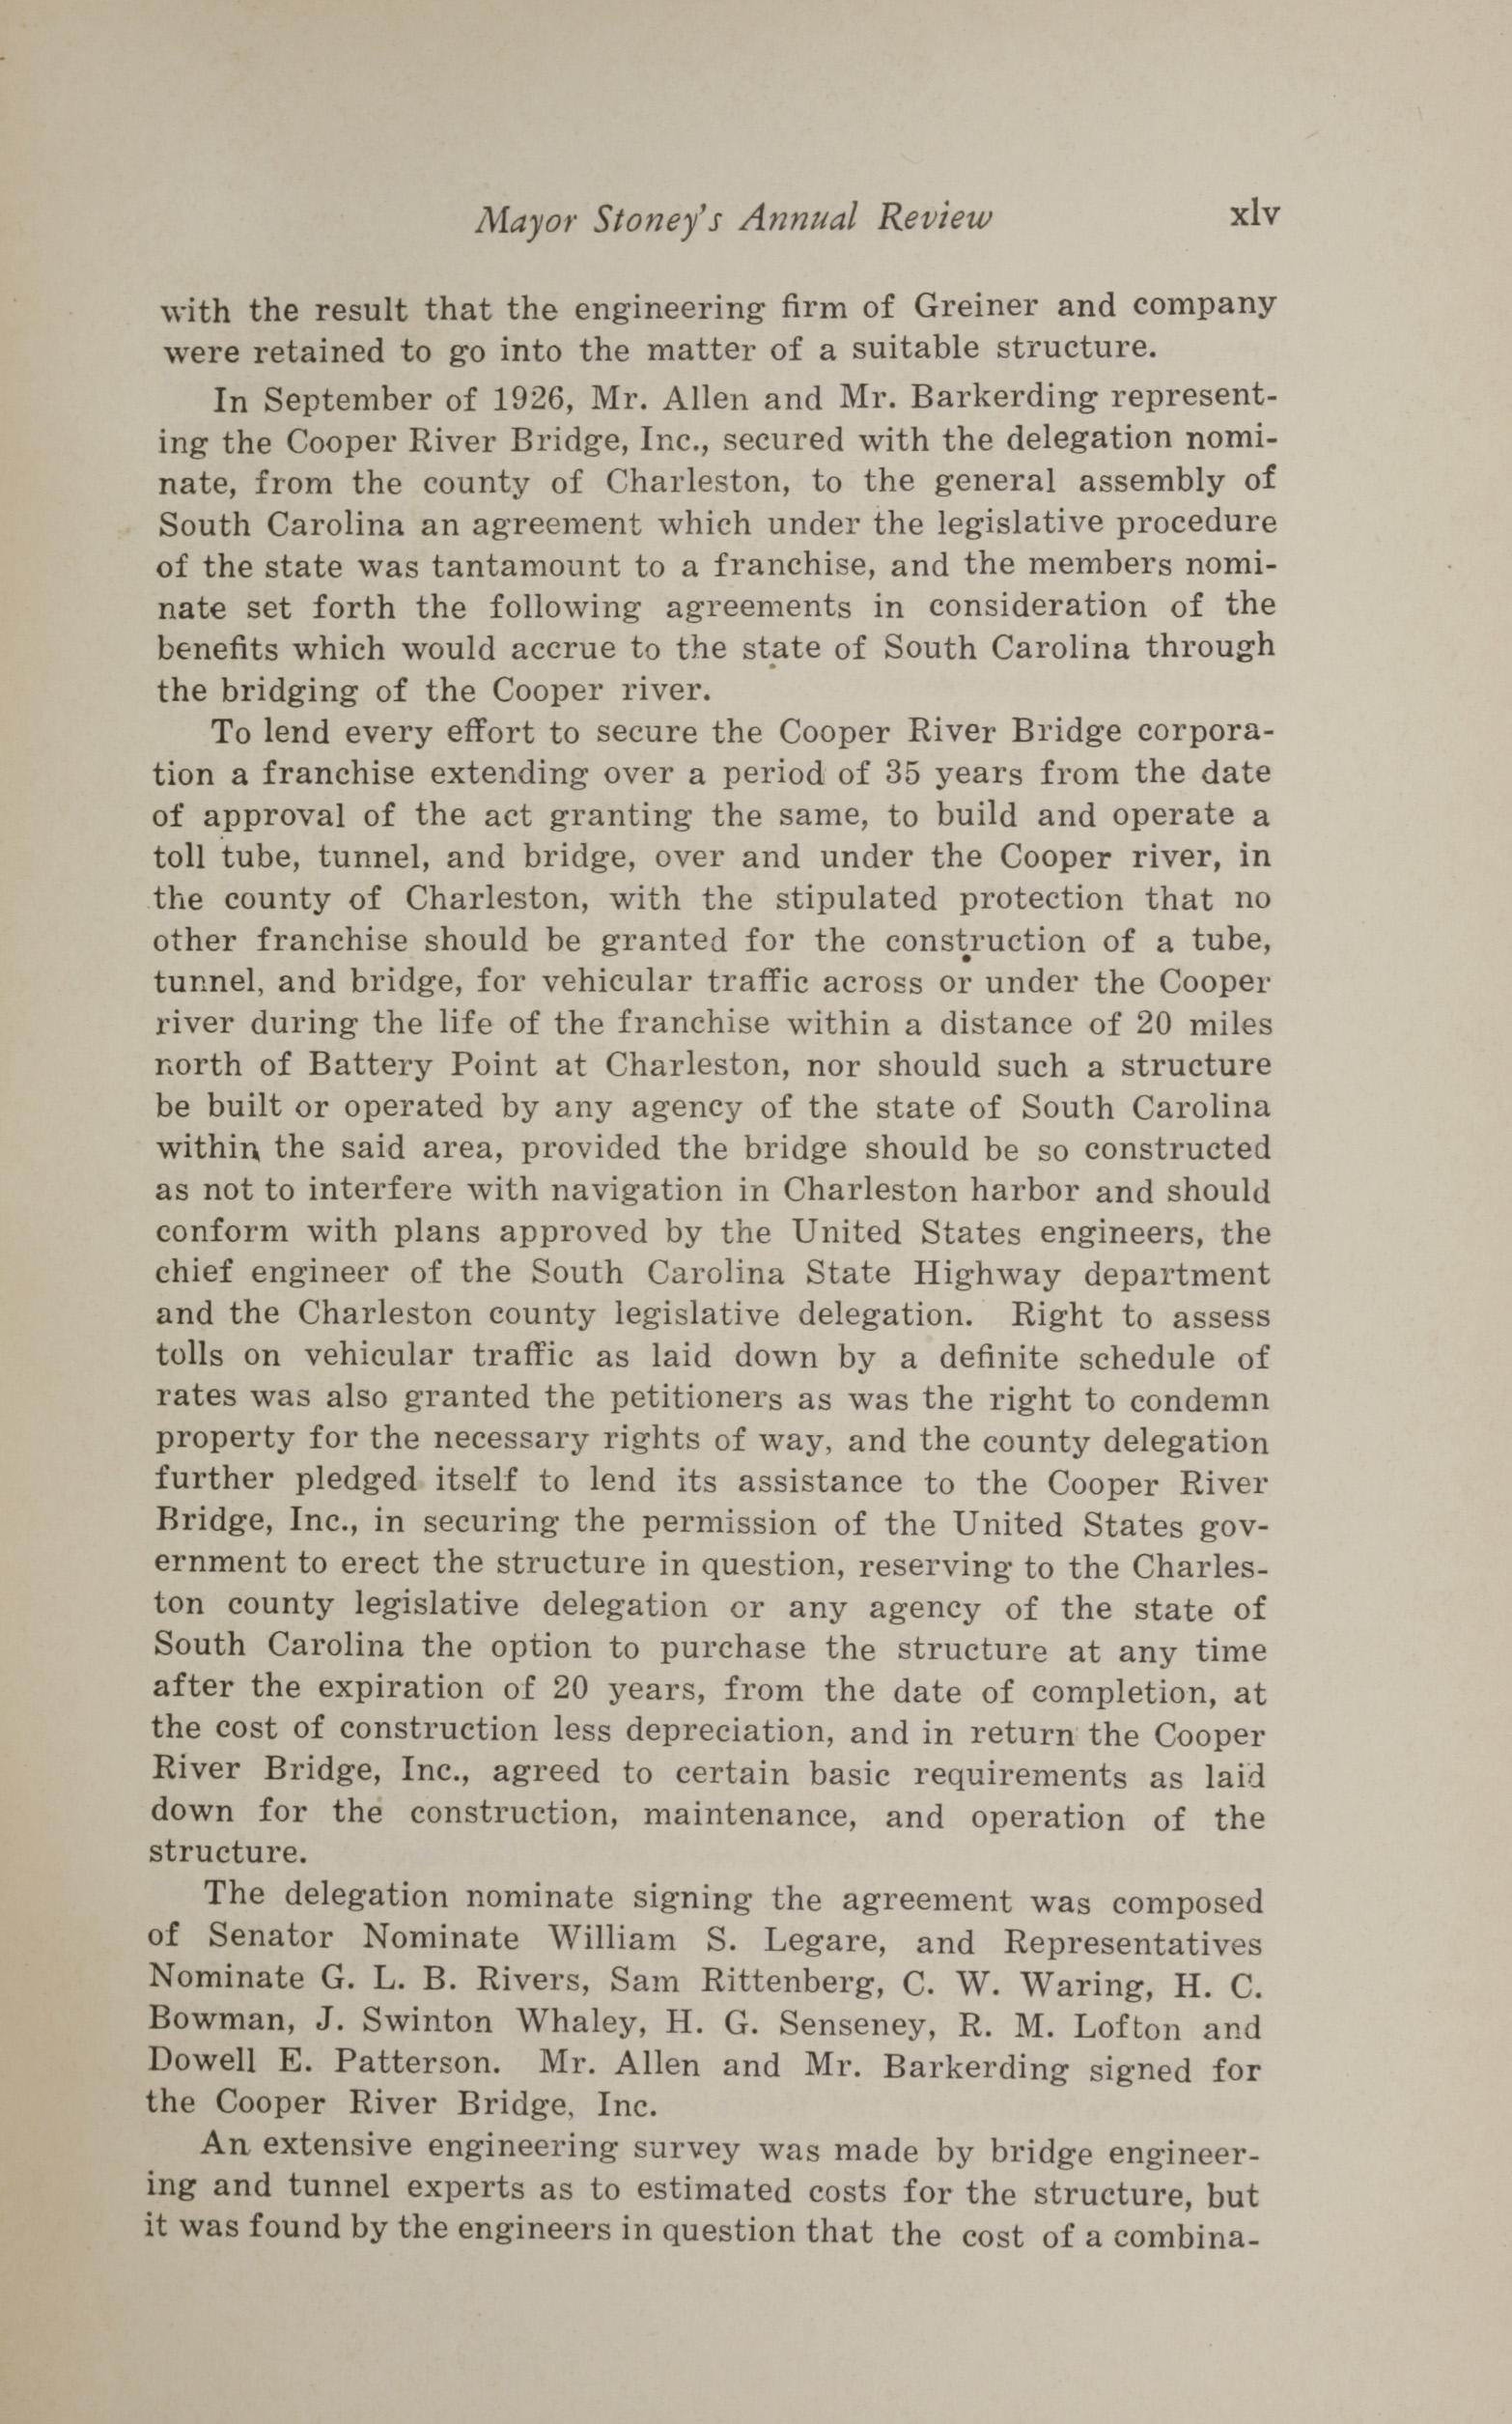 Charleston Yearbook, 1930, page xlv